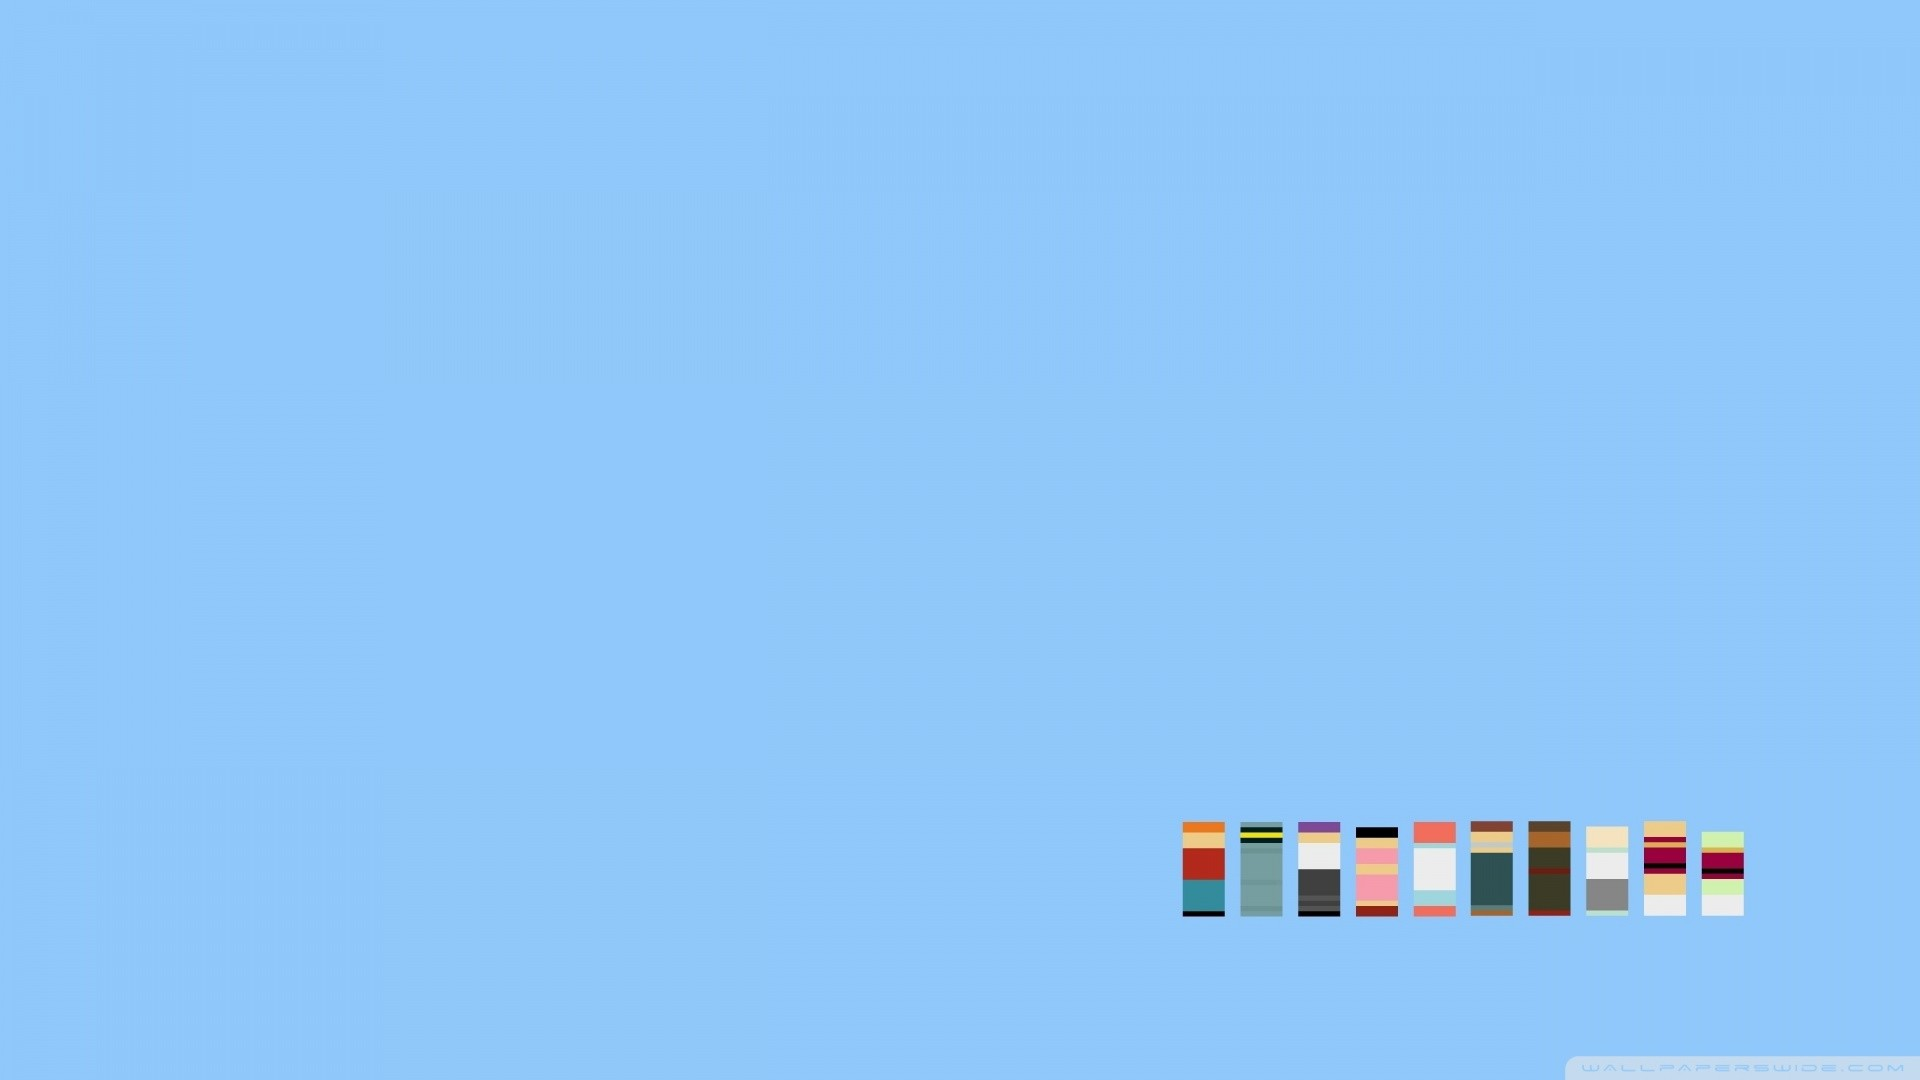 Futurama Minimalism Wallpaper Futurama, Minimalism